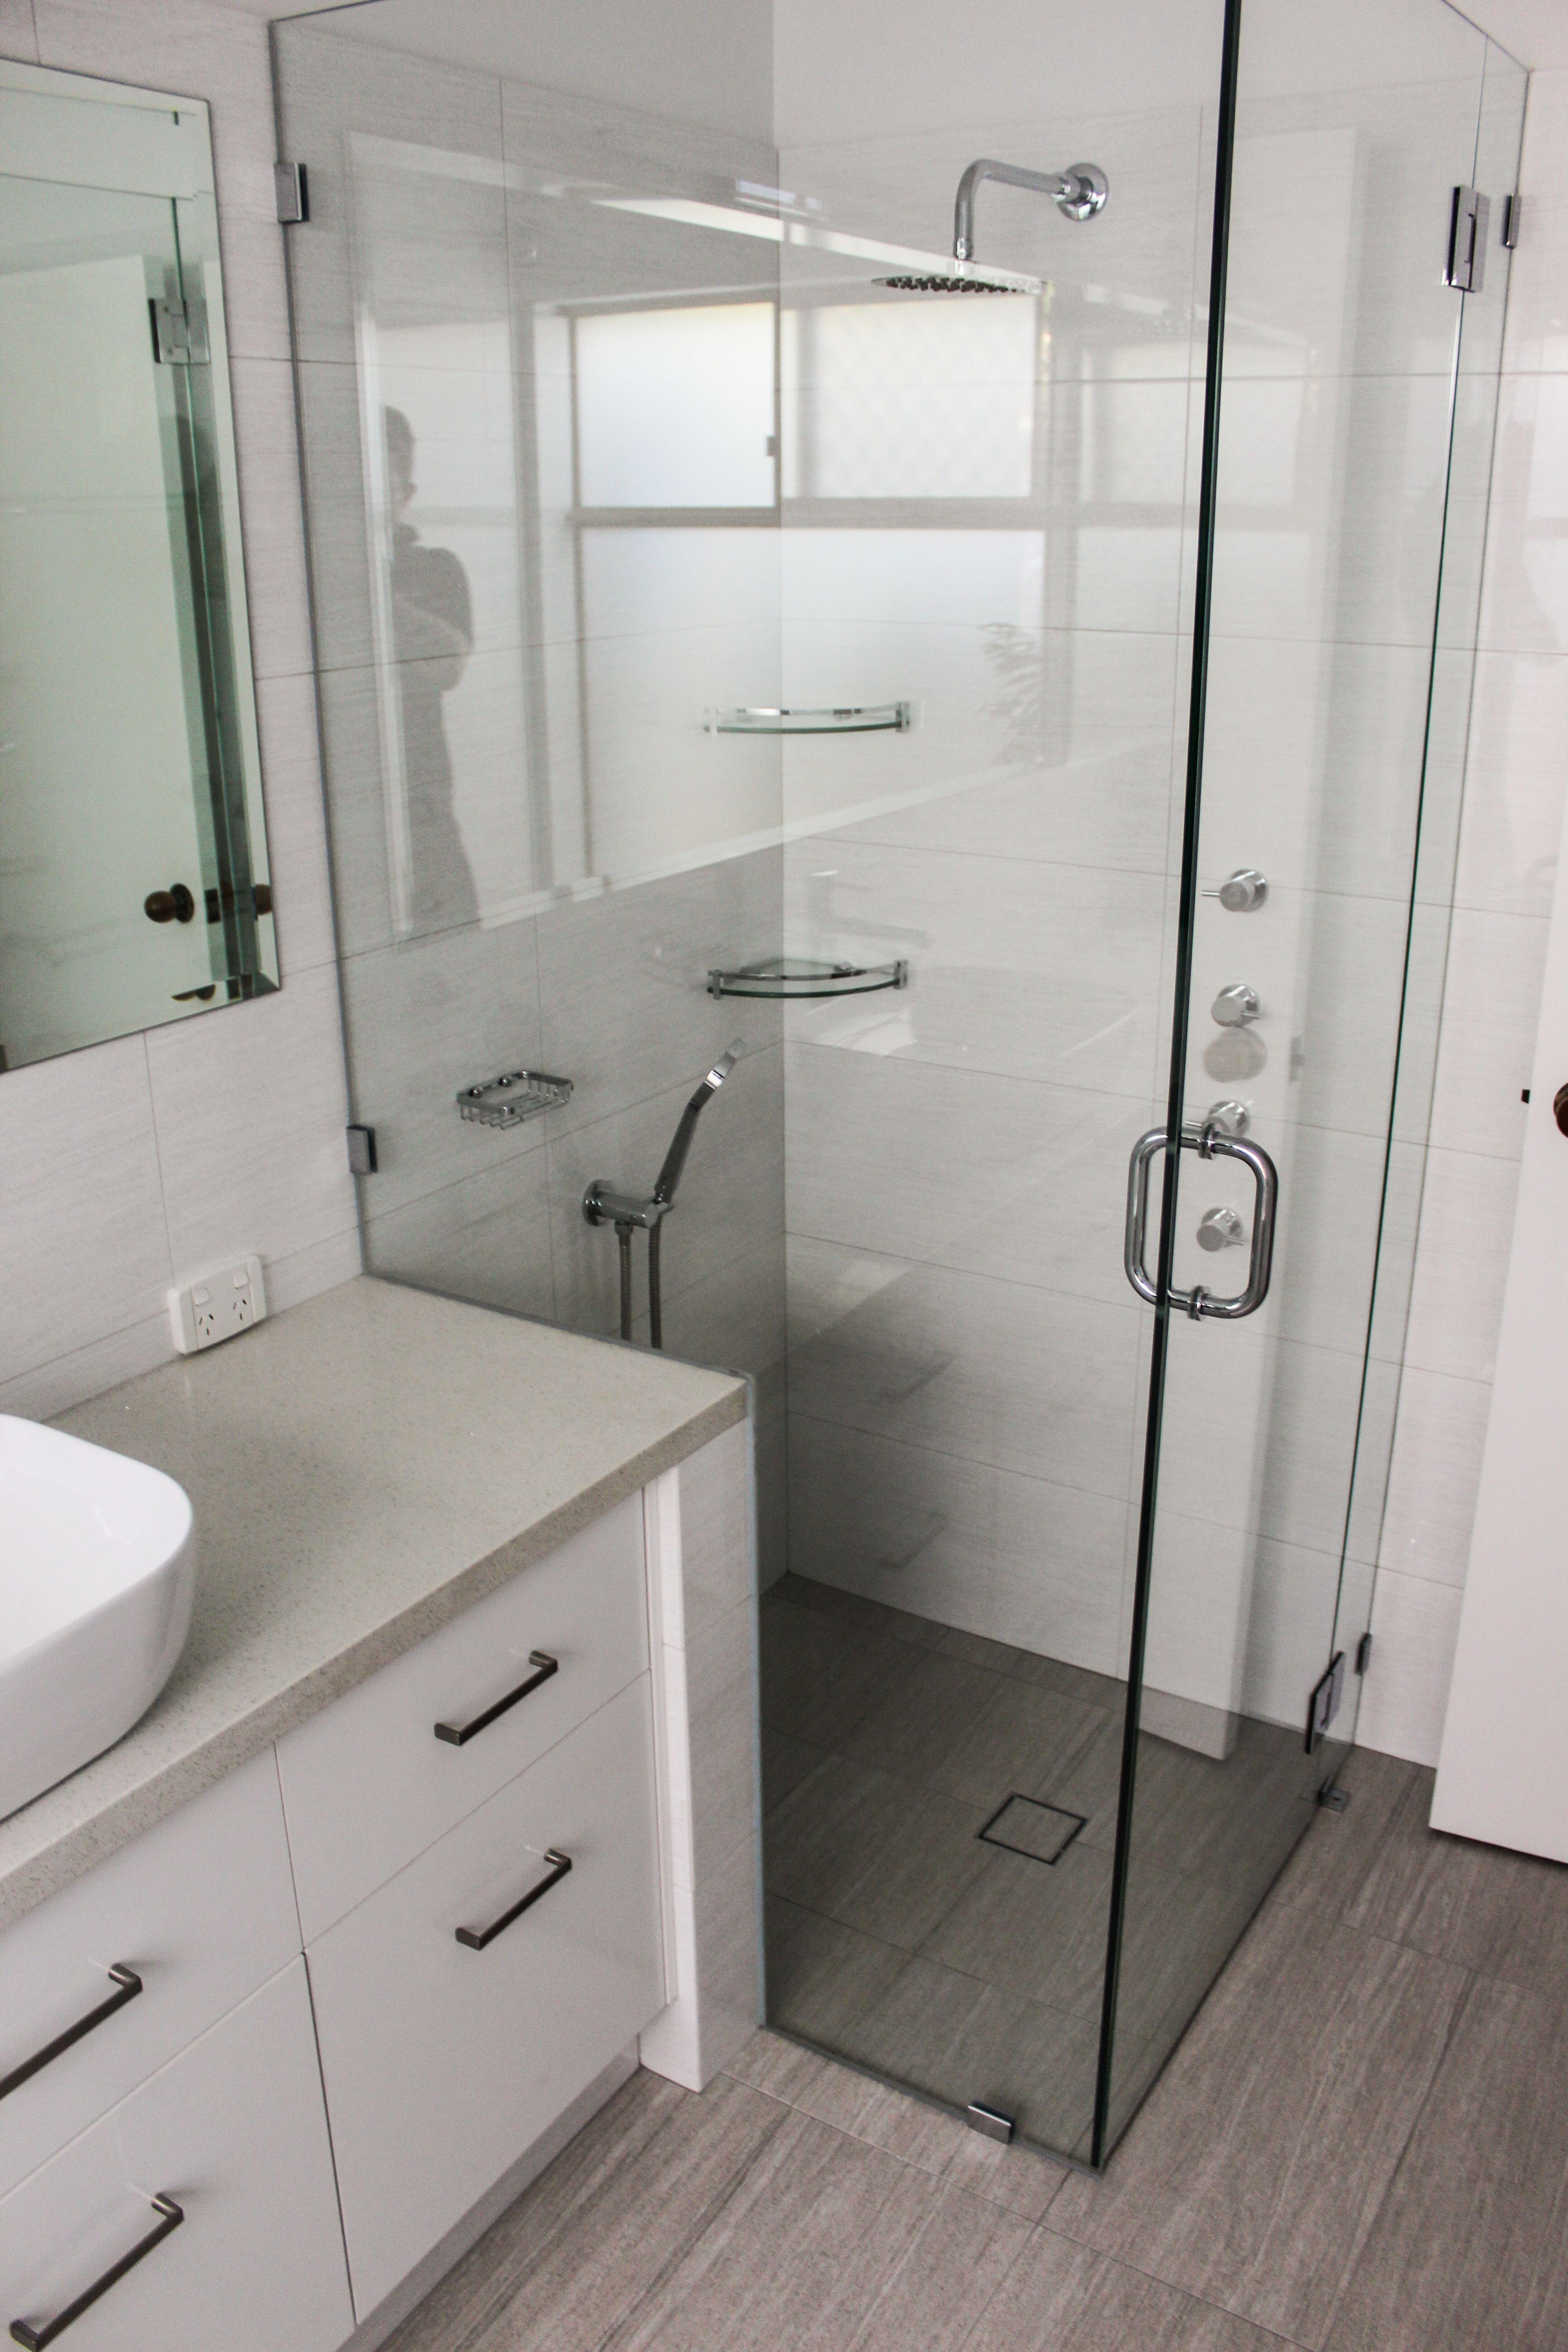 Frameless Shower Screen Pivot Shower Screen On The Ball Bathrooms Grey Bathrooms Tr Bathroom Renovations Perth Bathroom Renovation Trends Shower Screen